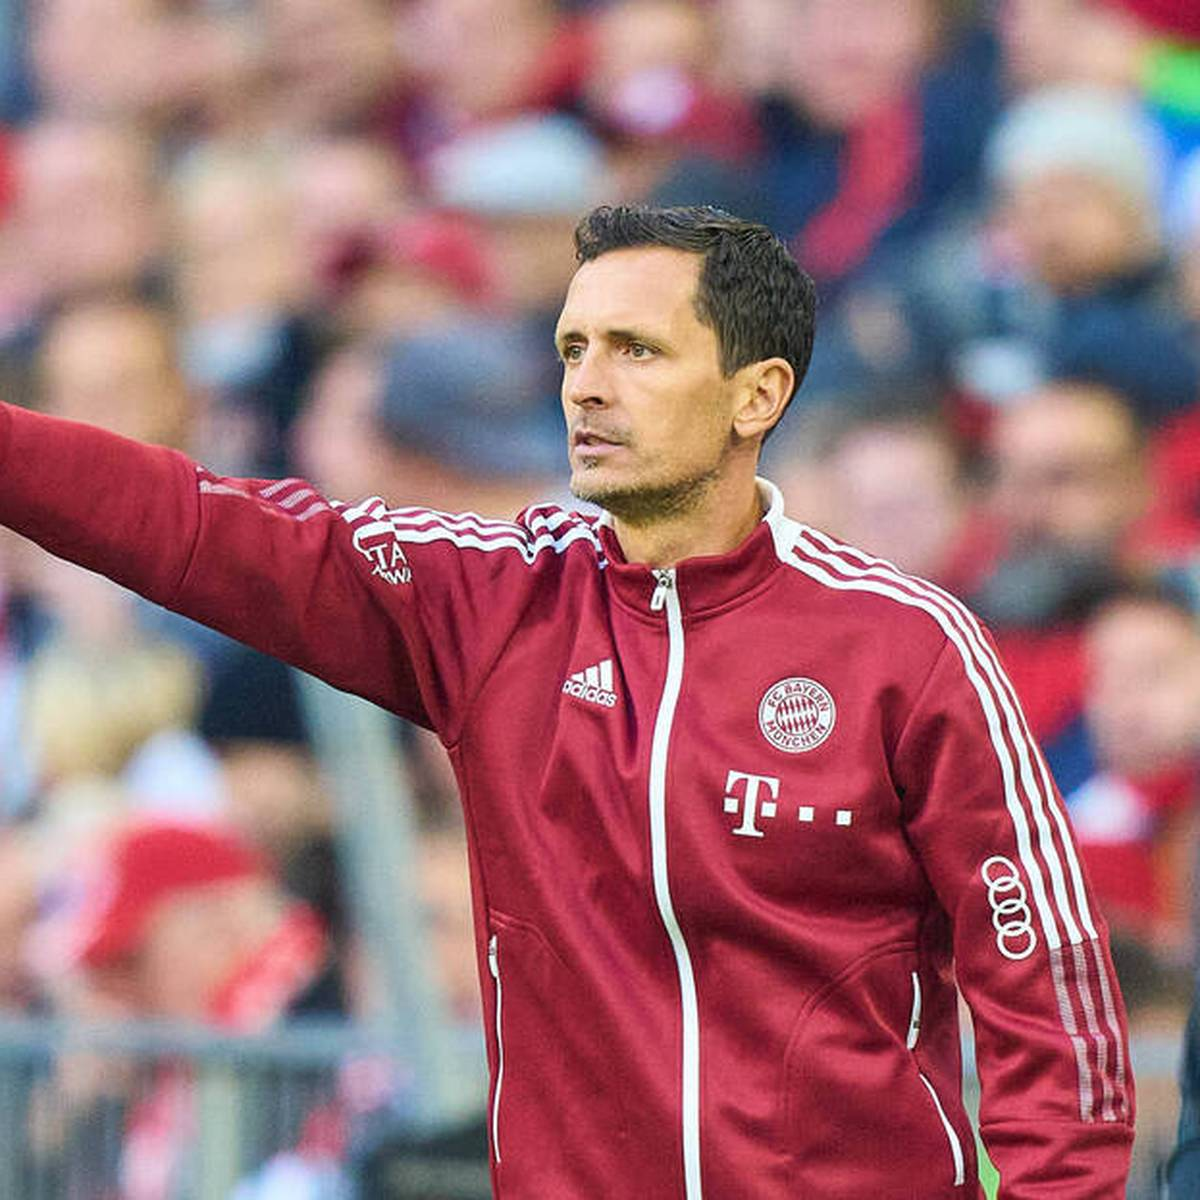 Bald Chefcoach? Das zeichnet Bayerns Toppmöller aus